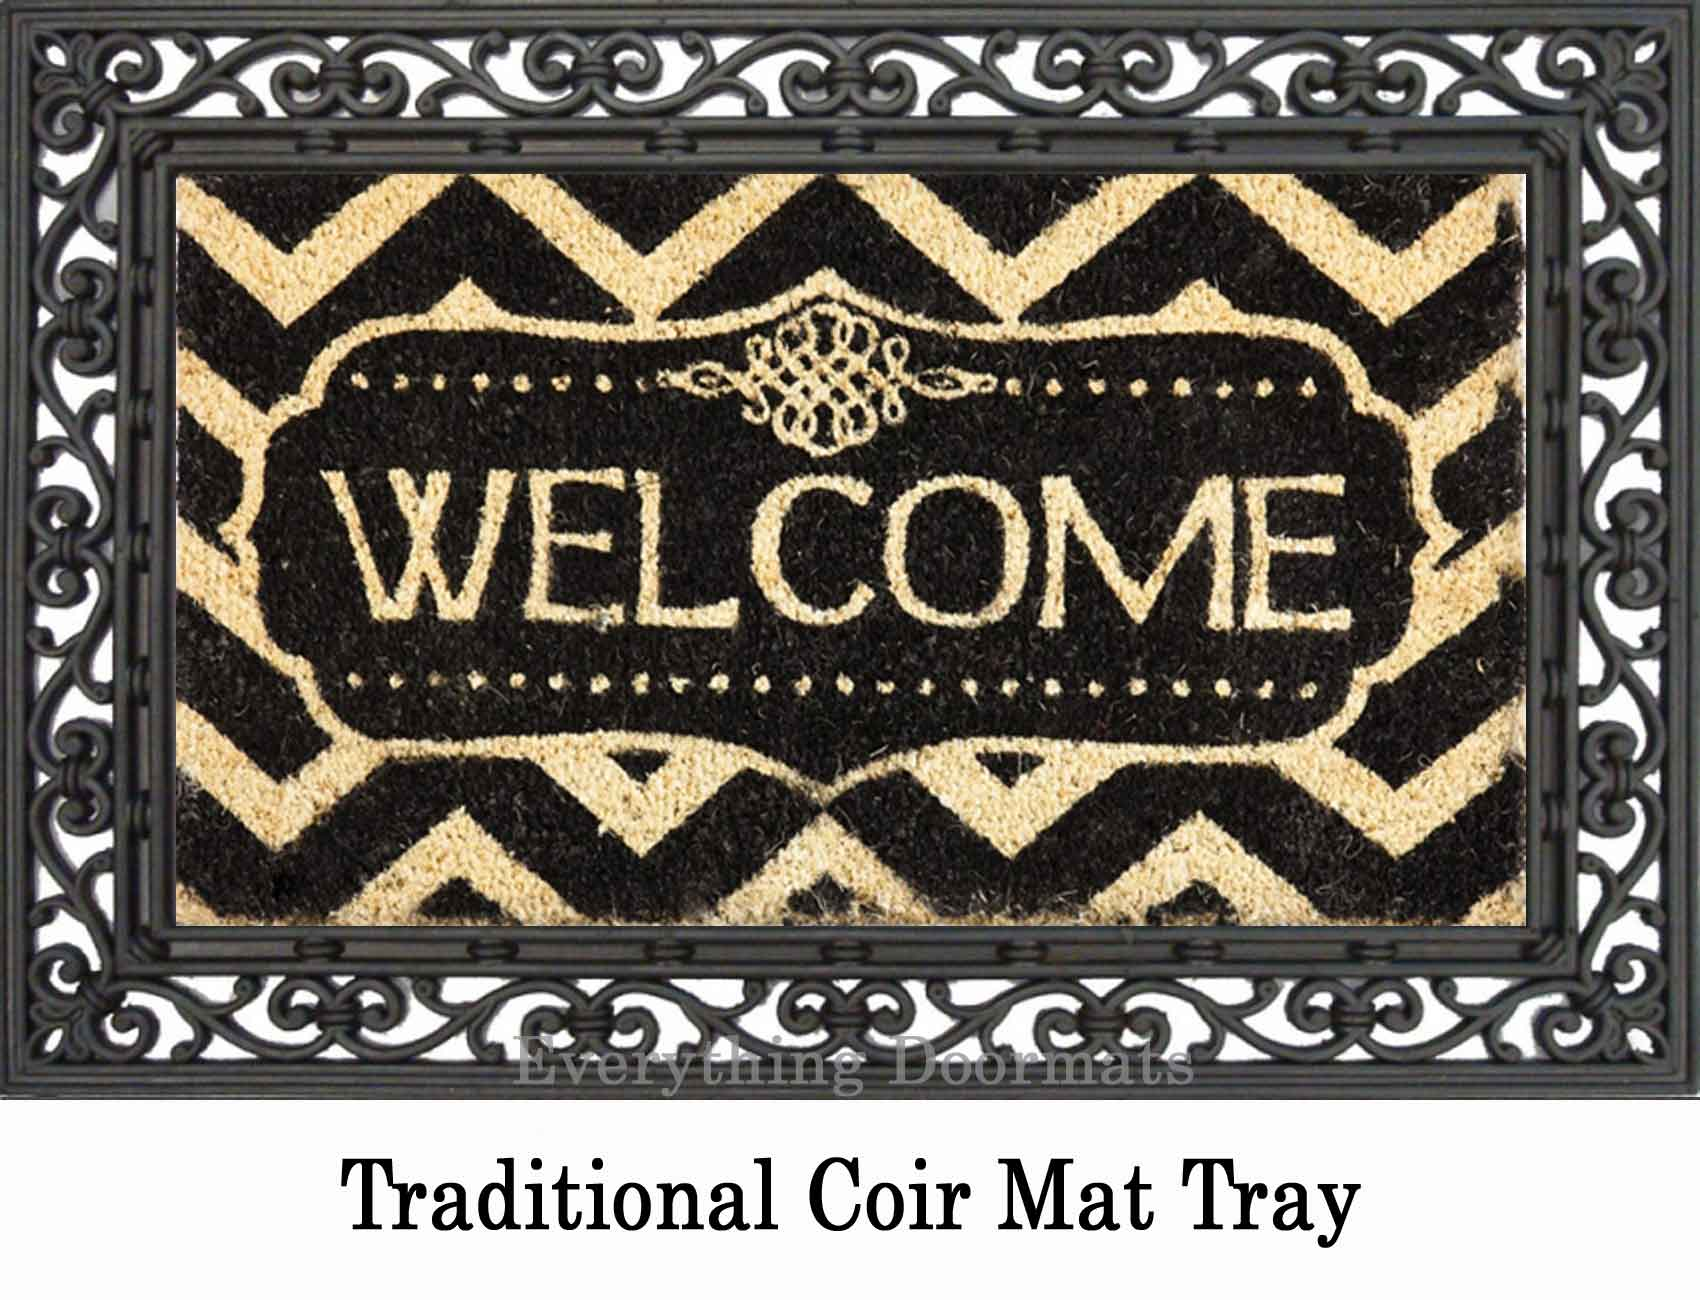 Coco Coir Decorative Welcome Backed Doormat 16 X 28